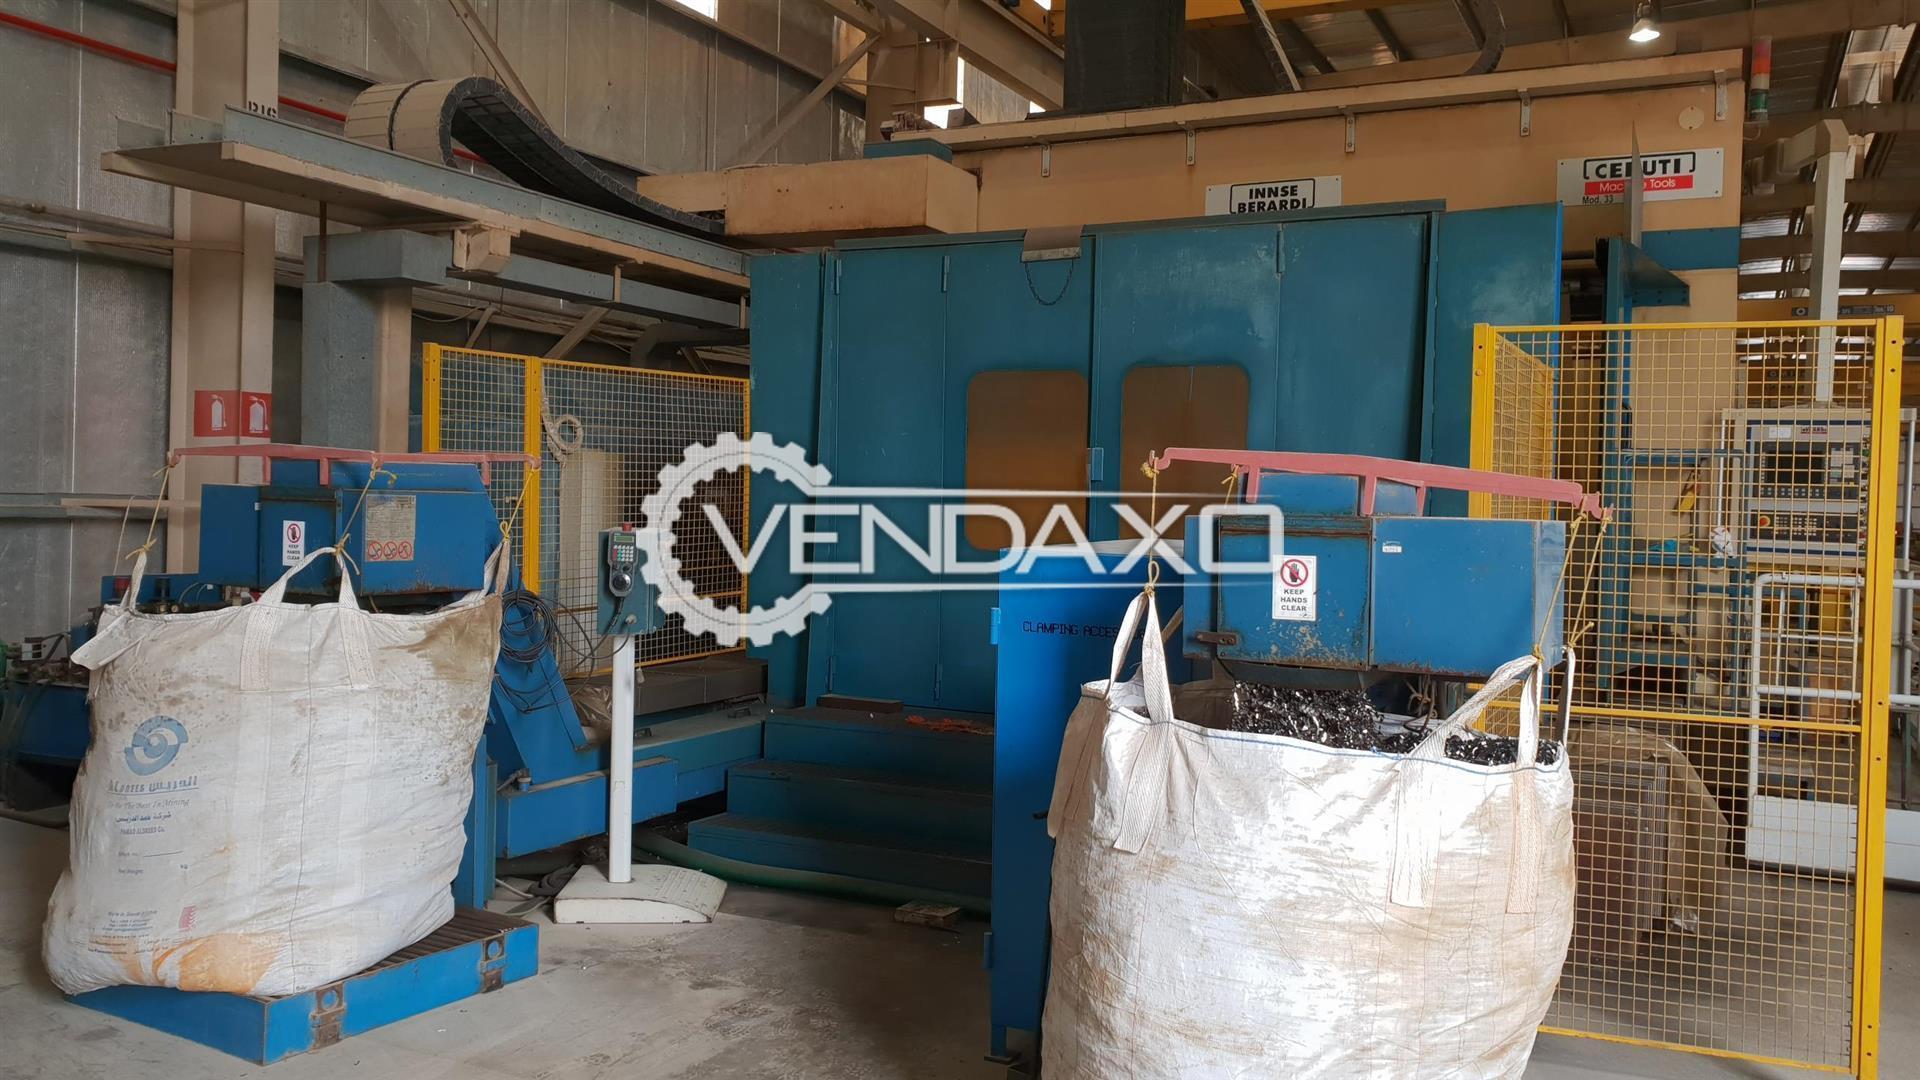 Innse Berardi Ceruti 33-14000 CNC Gantry Type Milling Machine - Table Size : 14000 x 3000 mm